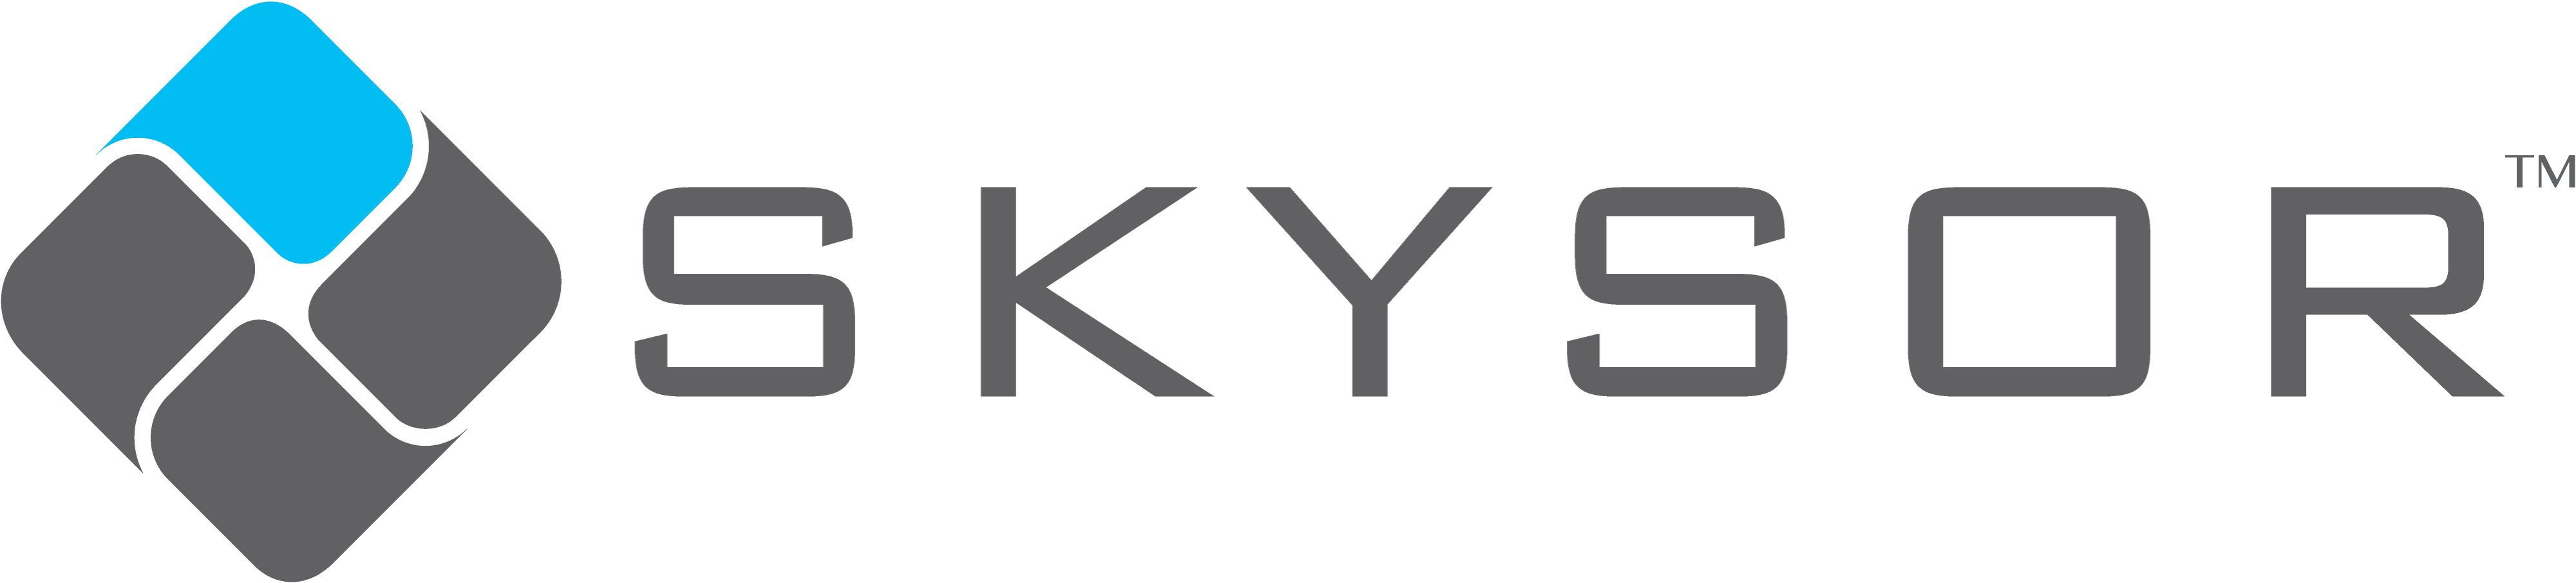 Skysor-TM